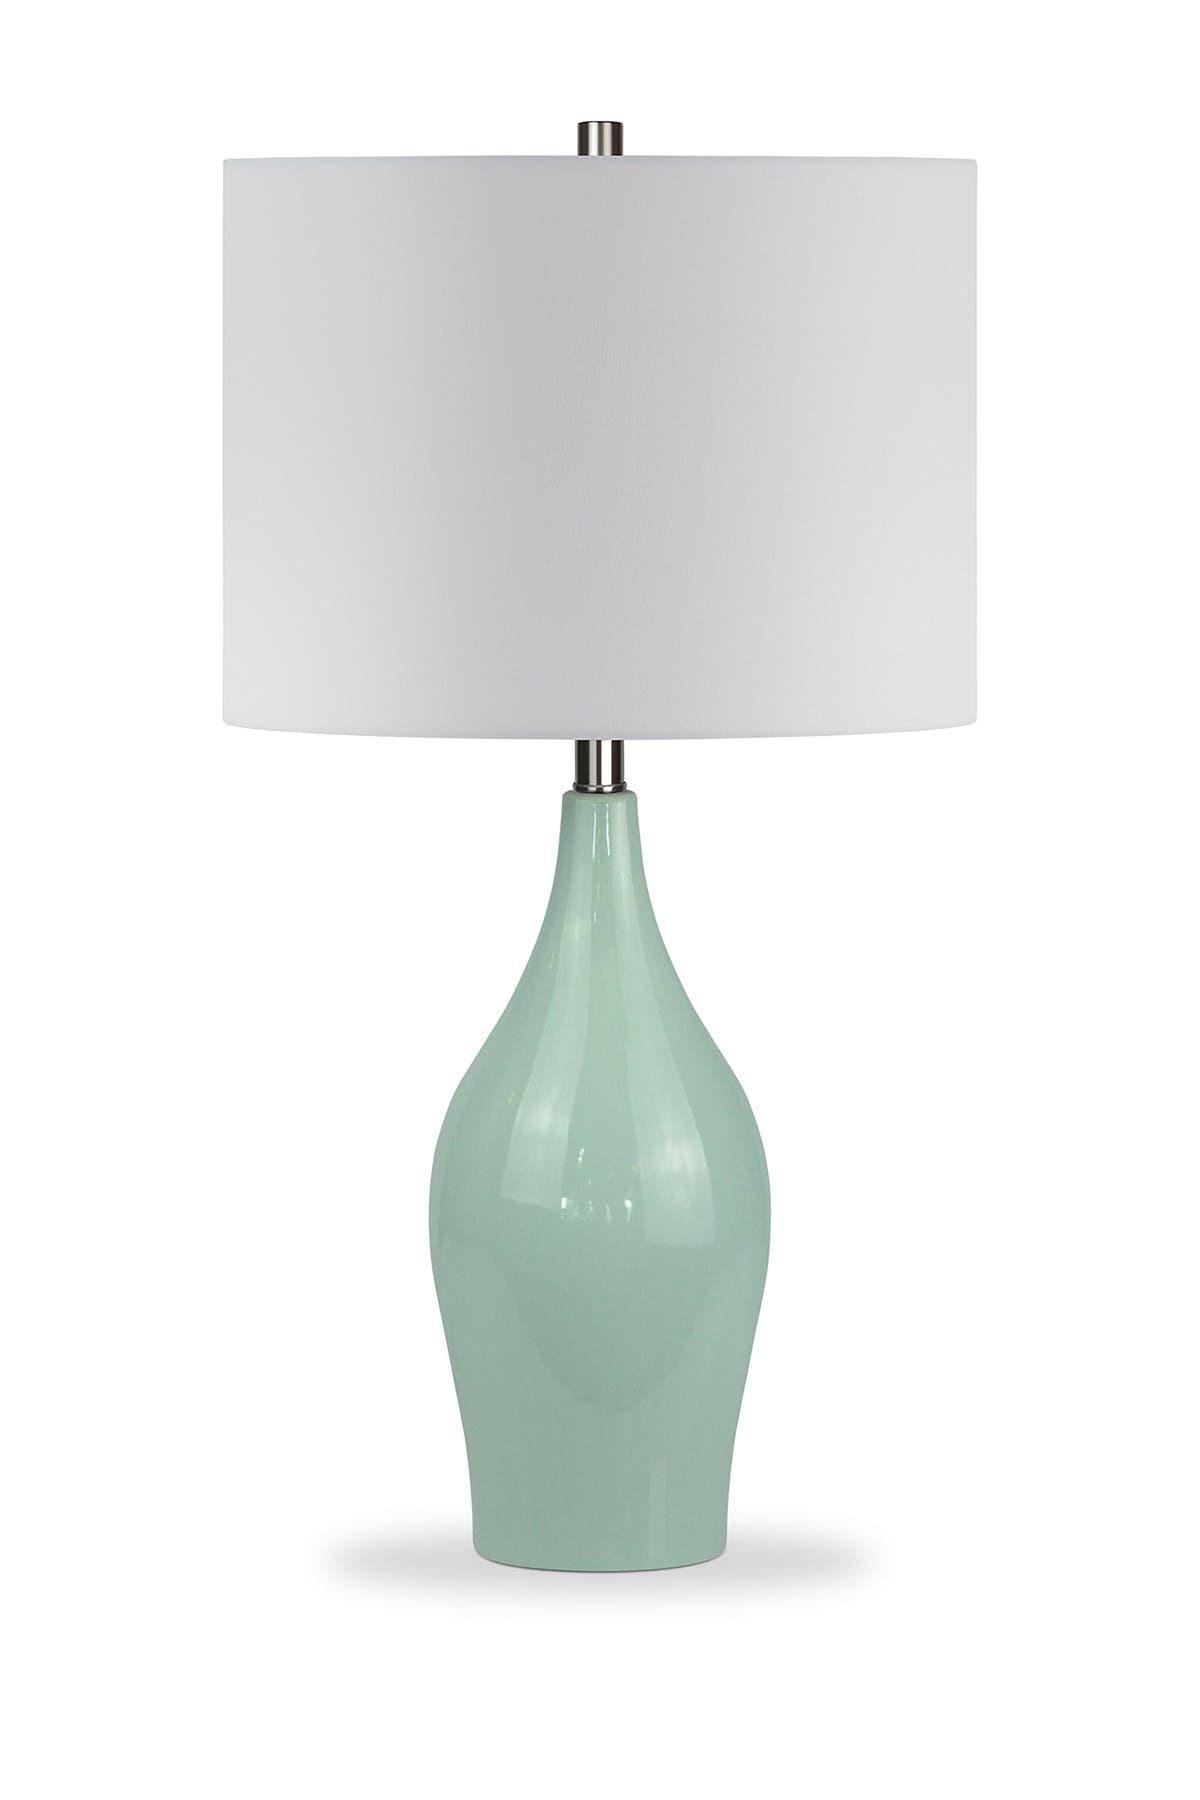 Image of Addison and Lane Niklas Table Lamp - Teal